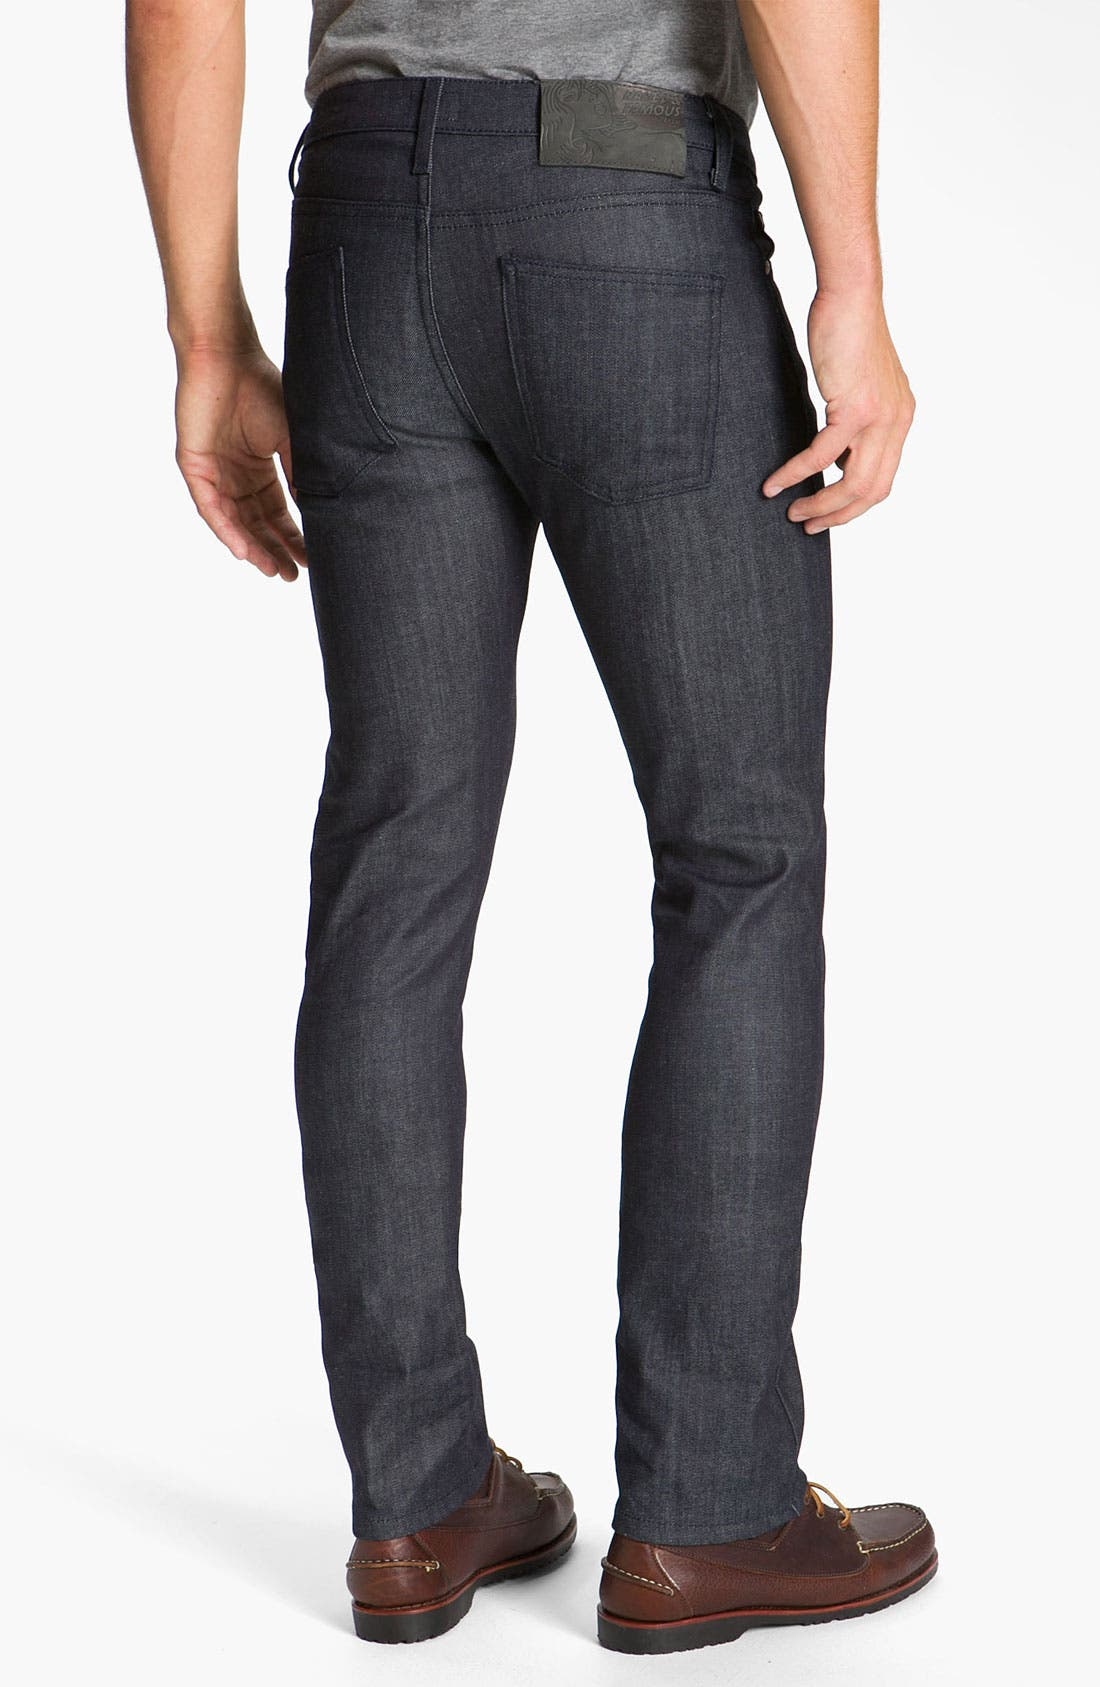 'Skinny Guy' Slim Cotton Cashmere Skinny Leg Jeans, Main, color, 400